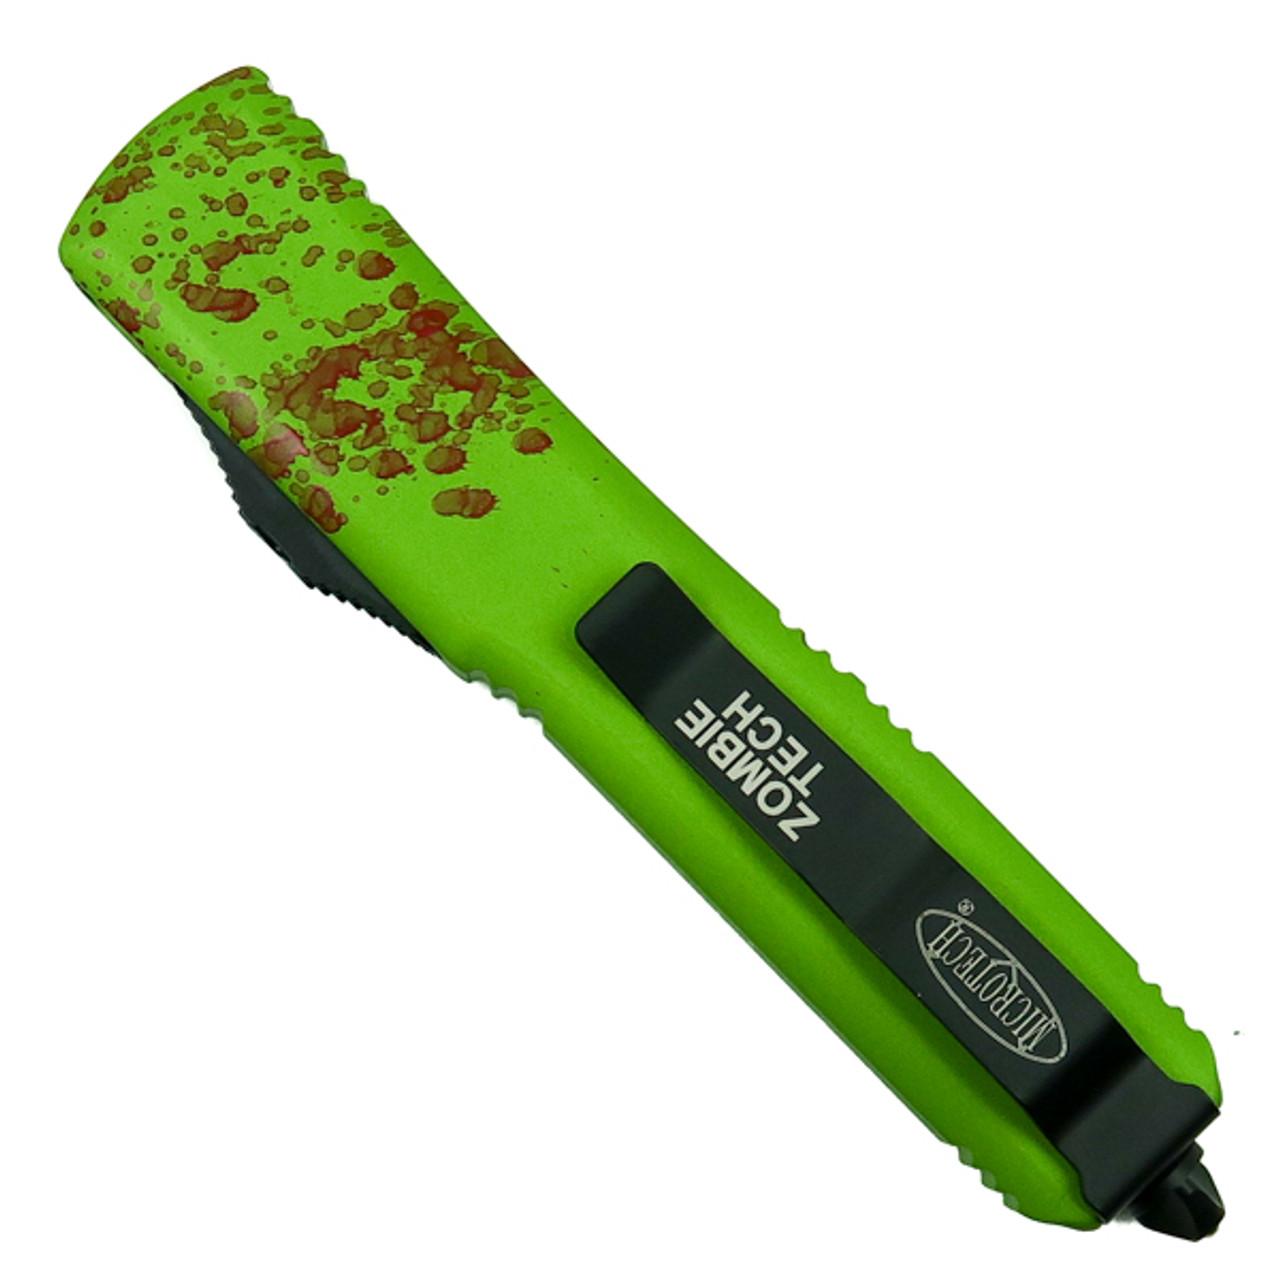 Microtech Zombie Ultratech Dagger OTF Auto Knife, Black Blade Back View